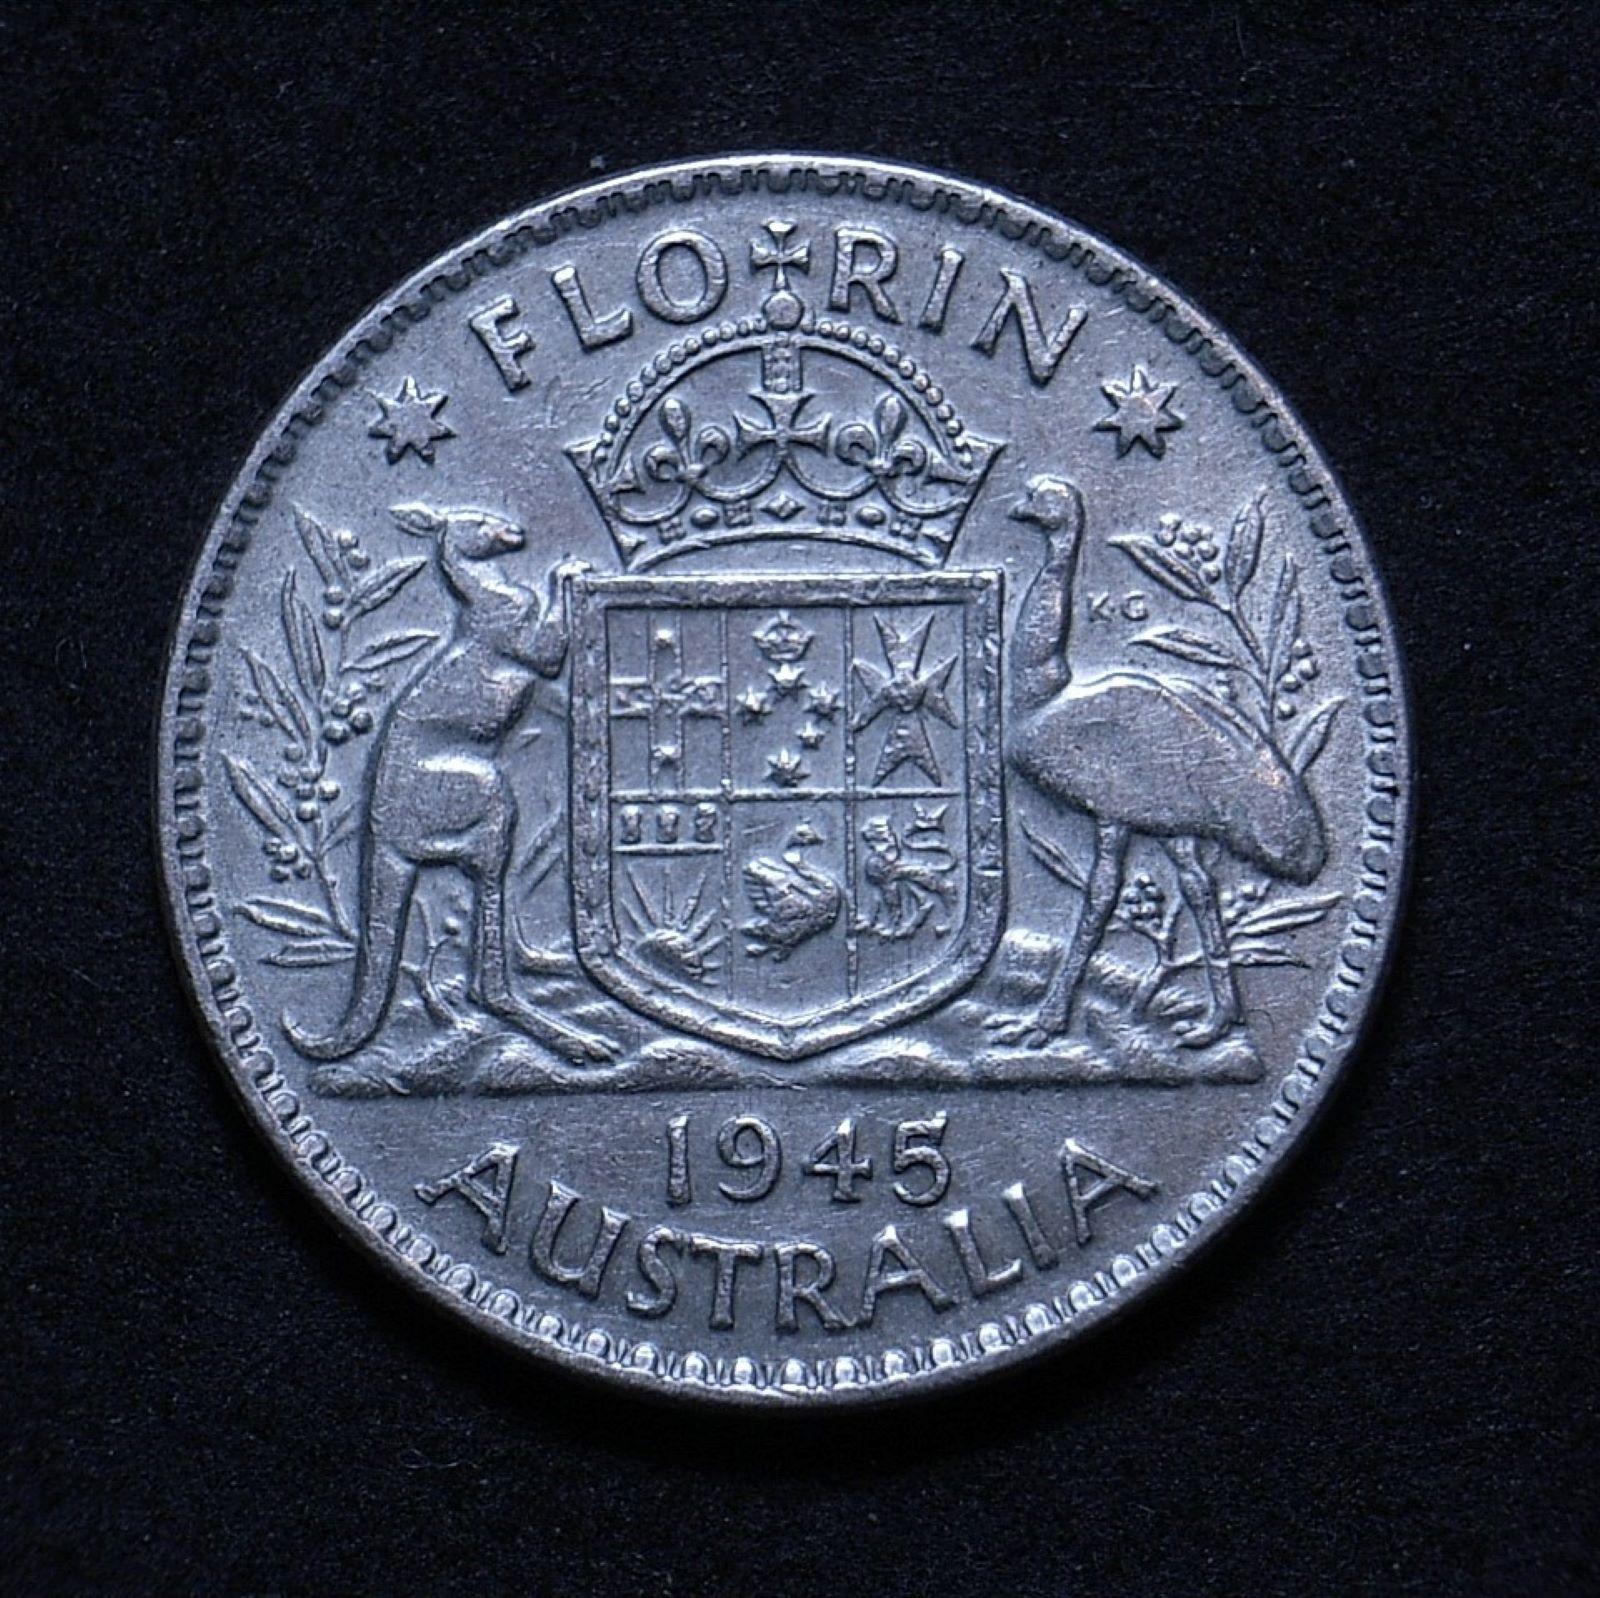 1Aus Florin 1945 rev